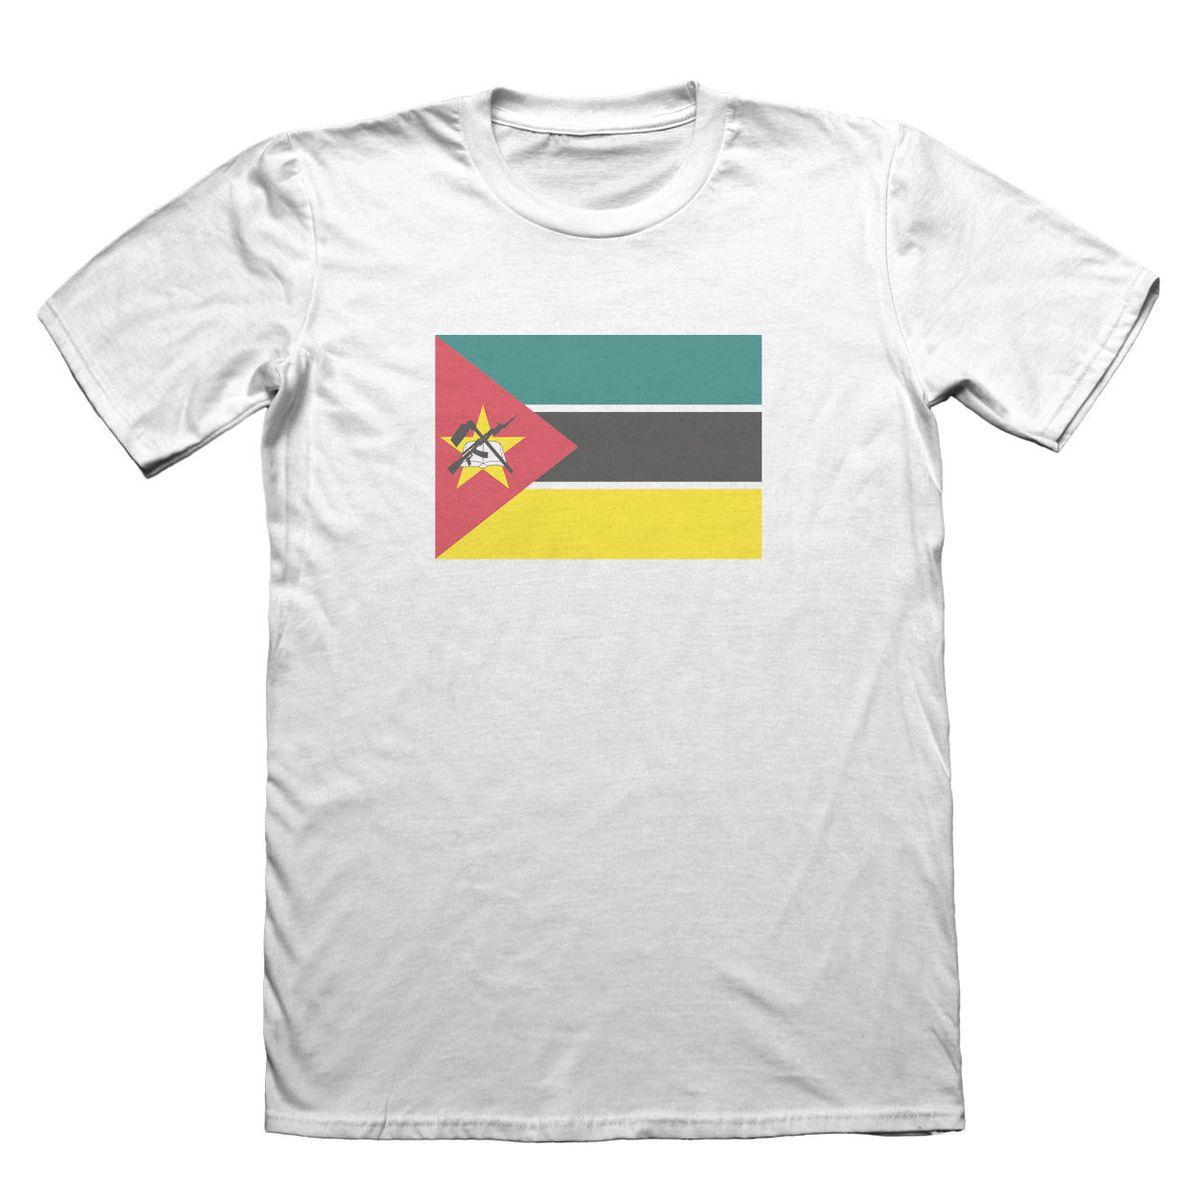 8a7558c11ecf3 Mozambique T Shirt Funny Mens Gift  5407 Personalized T Shirt Custom T Shirt  Printed Mens Men T Shirt Buy Tshirt Political Shirts From Qz106152964